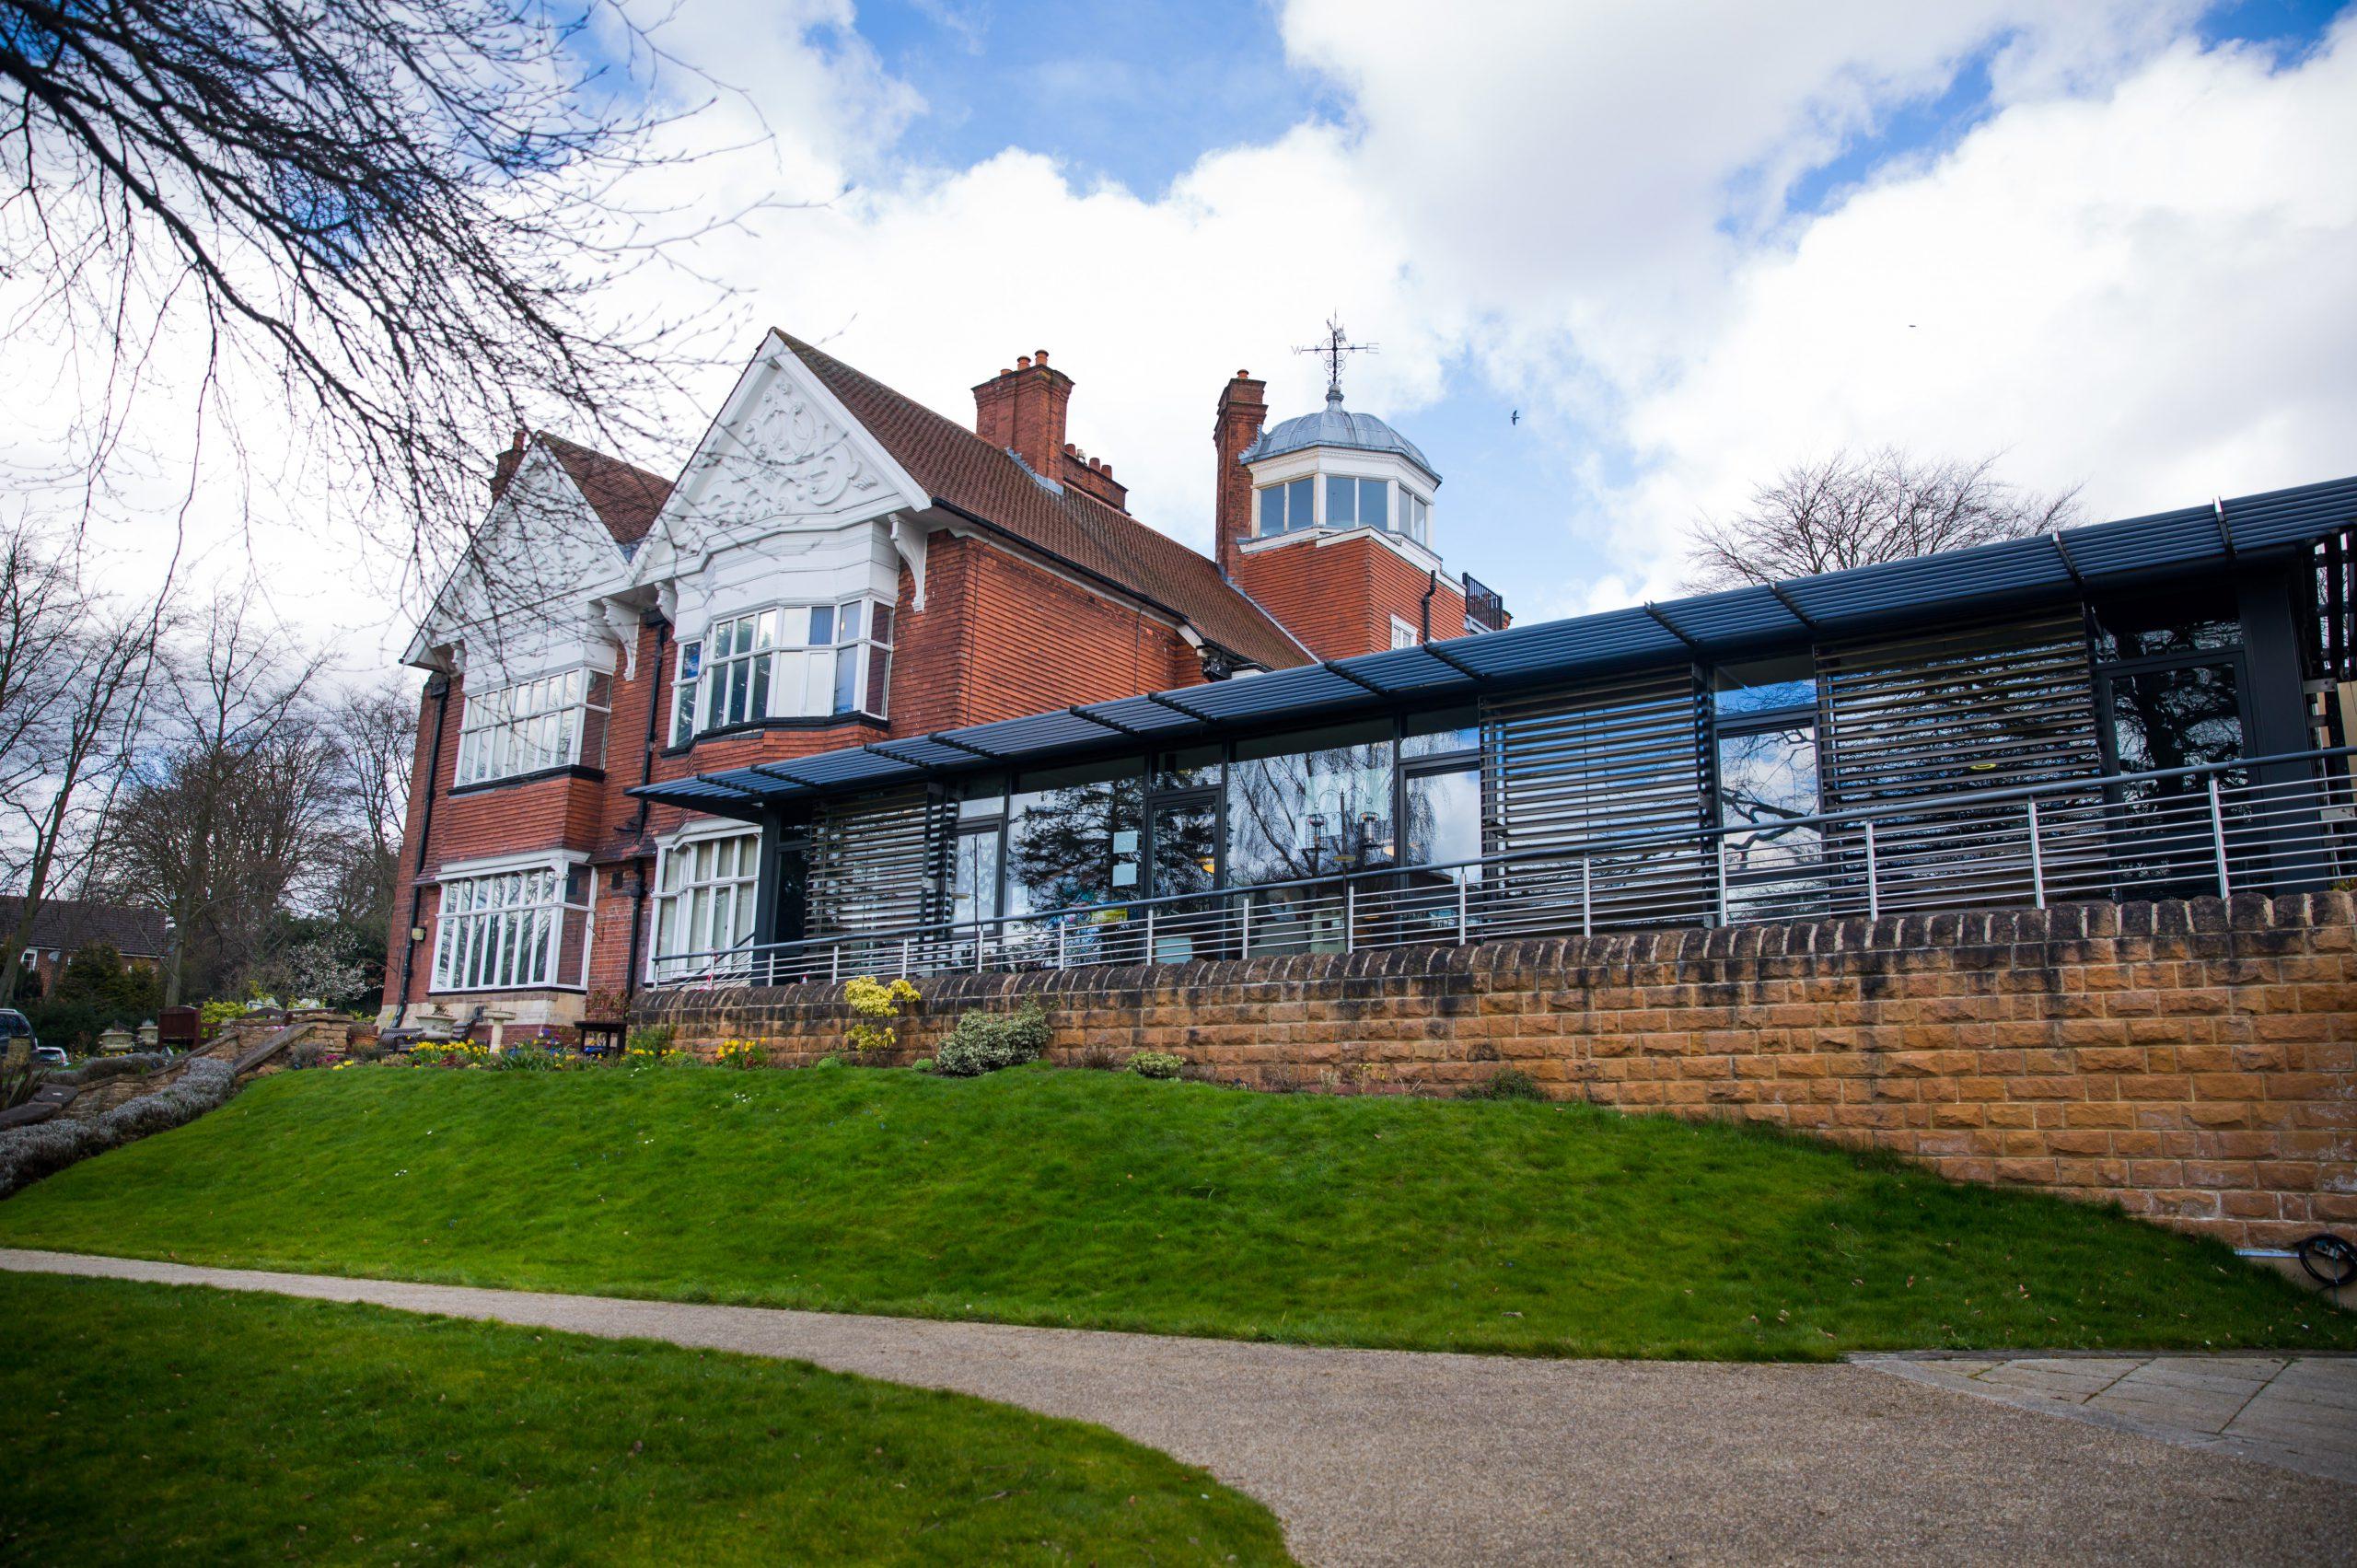 Fernleigh House today